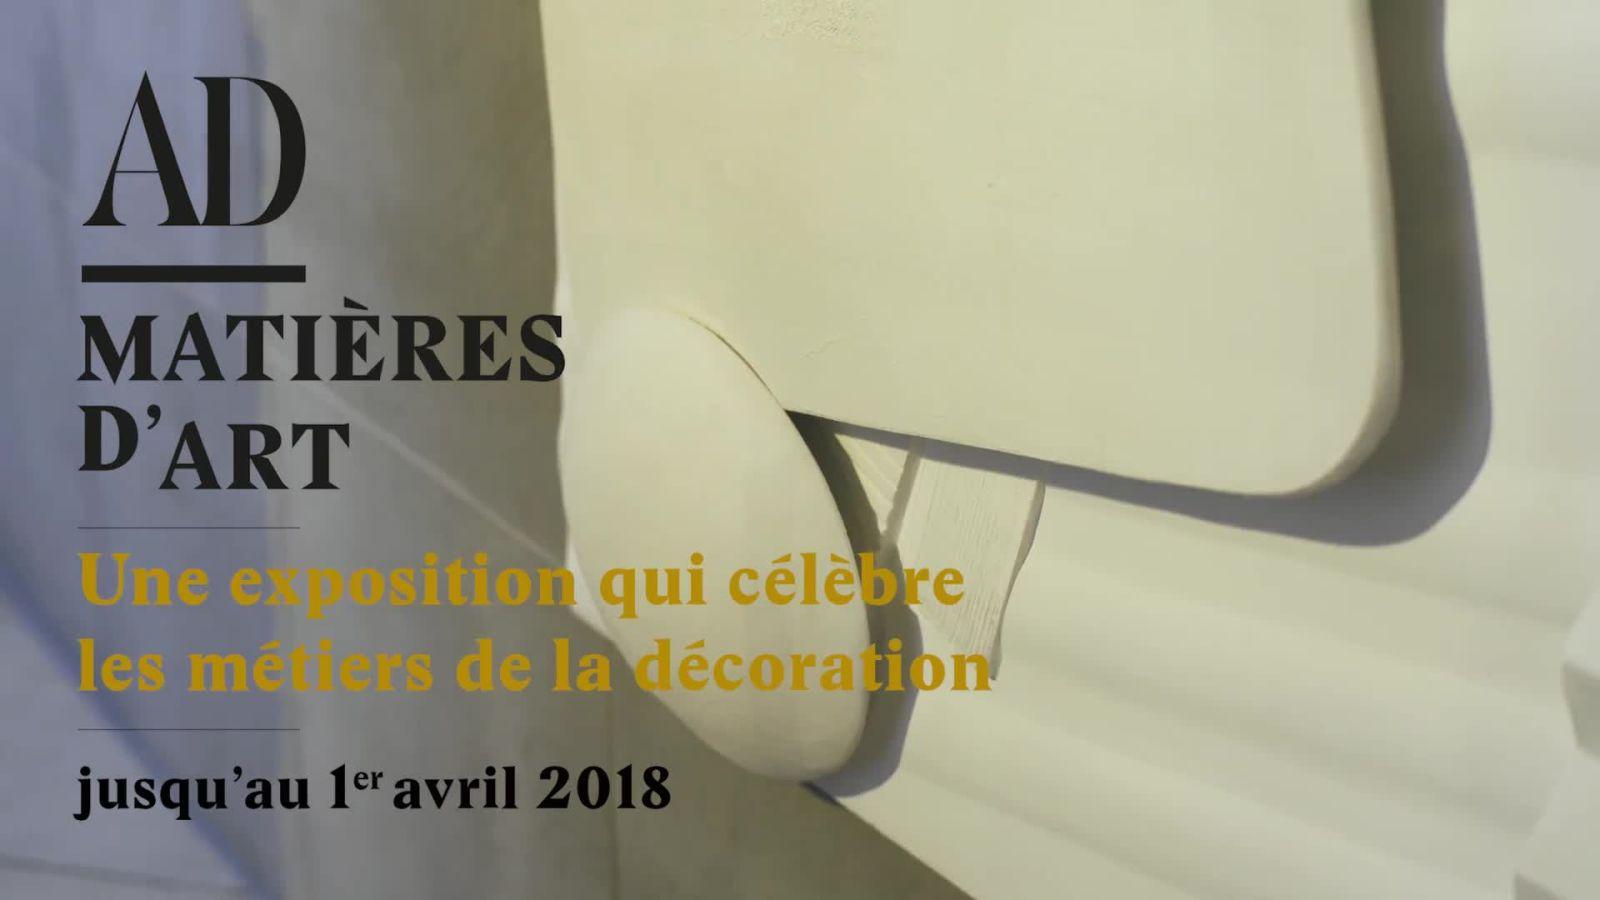 AD Matières d'art au Palais d'Iéna